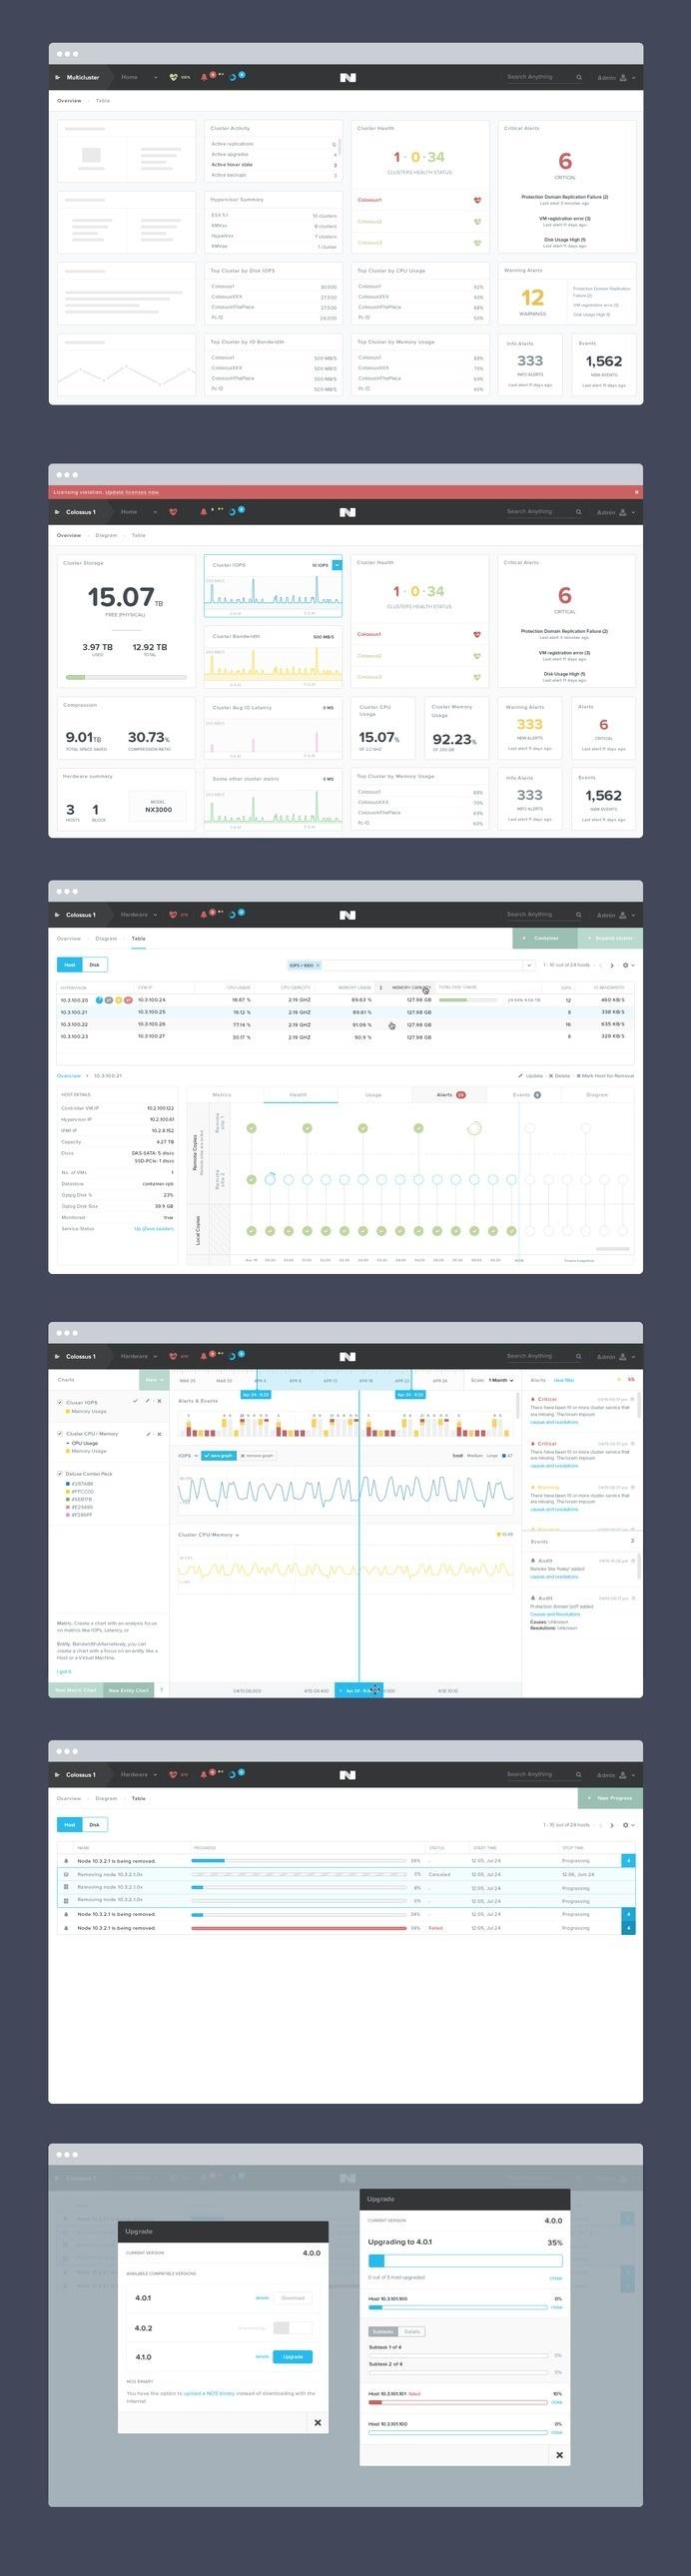 Nutanix design iteration presentation #dashboard